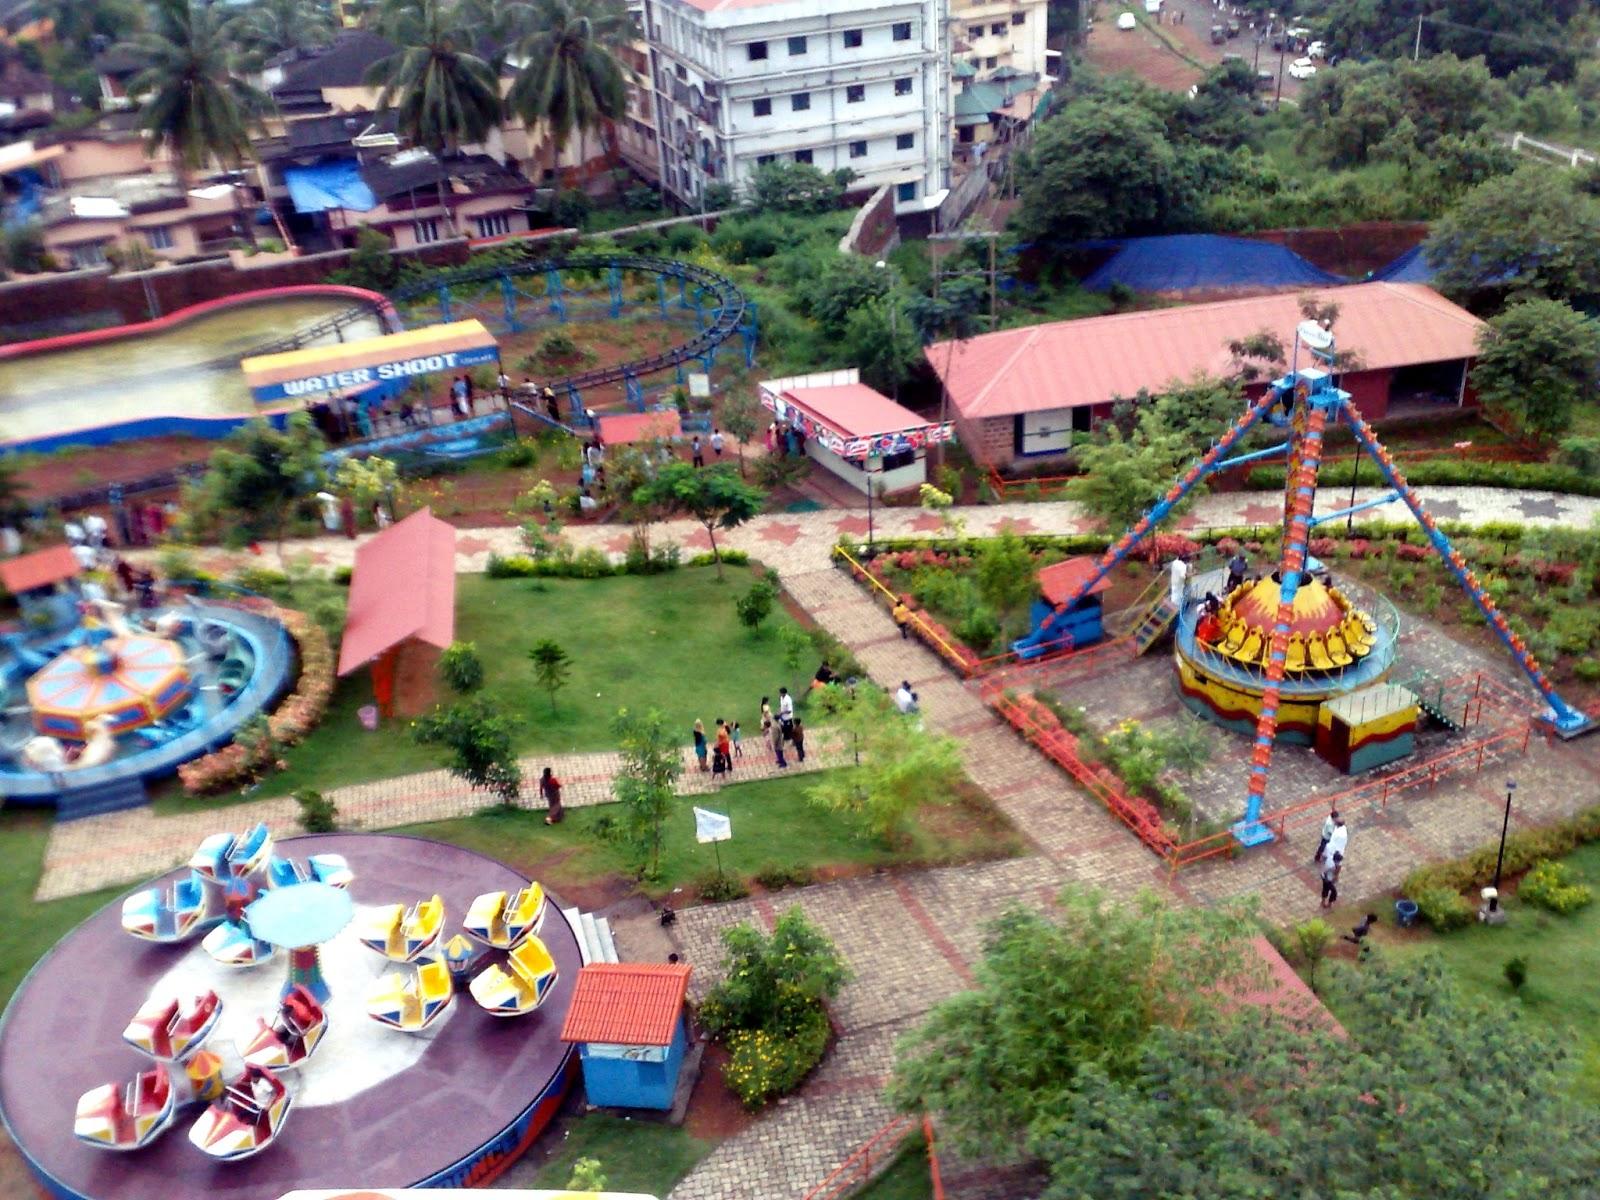 Kottakunnu Malappuram Tourist Places